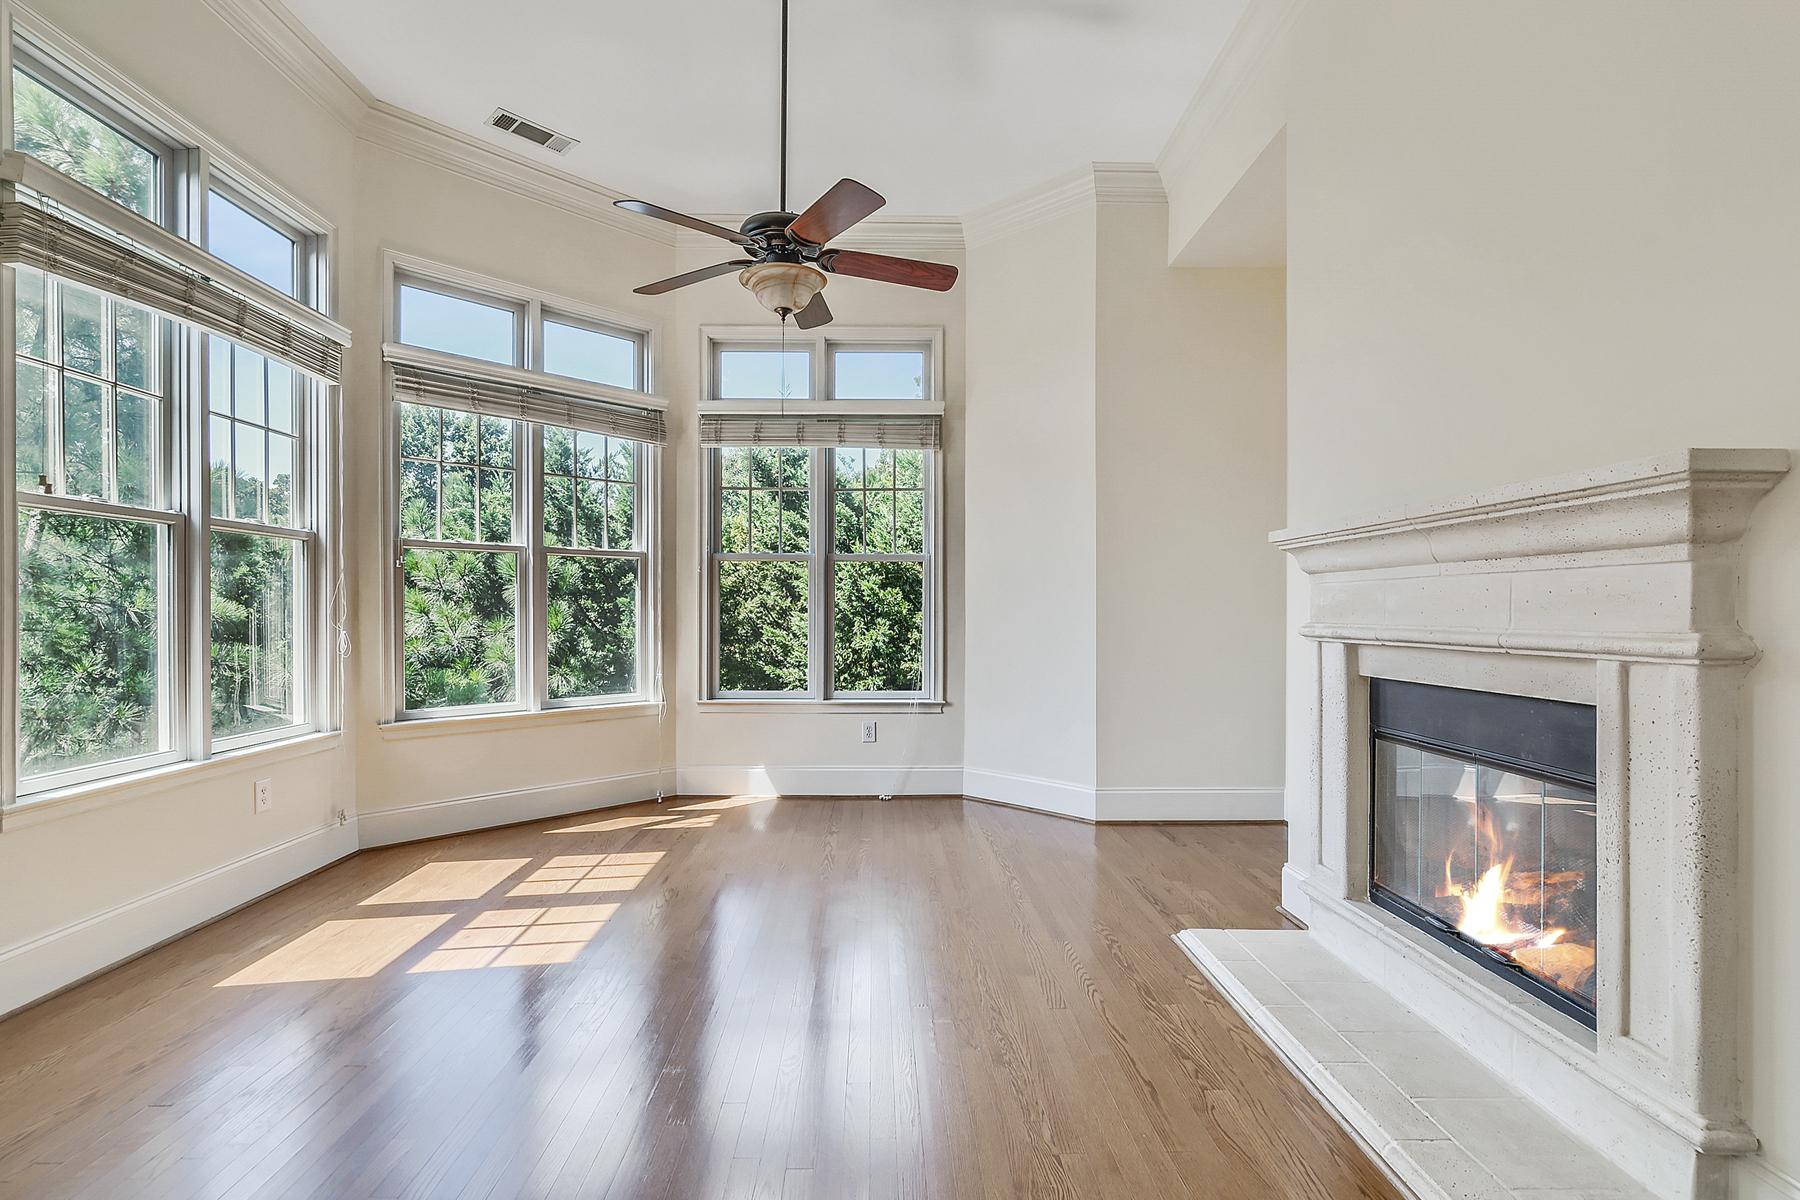 Condominium for Sale at Hip Condo In Phenomenal Location 828 Highland Ln 2304 Atlanta, Georgia 30306 United States